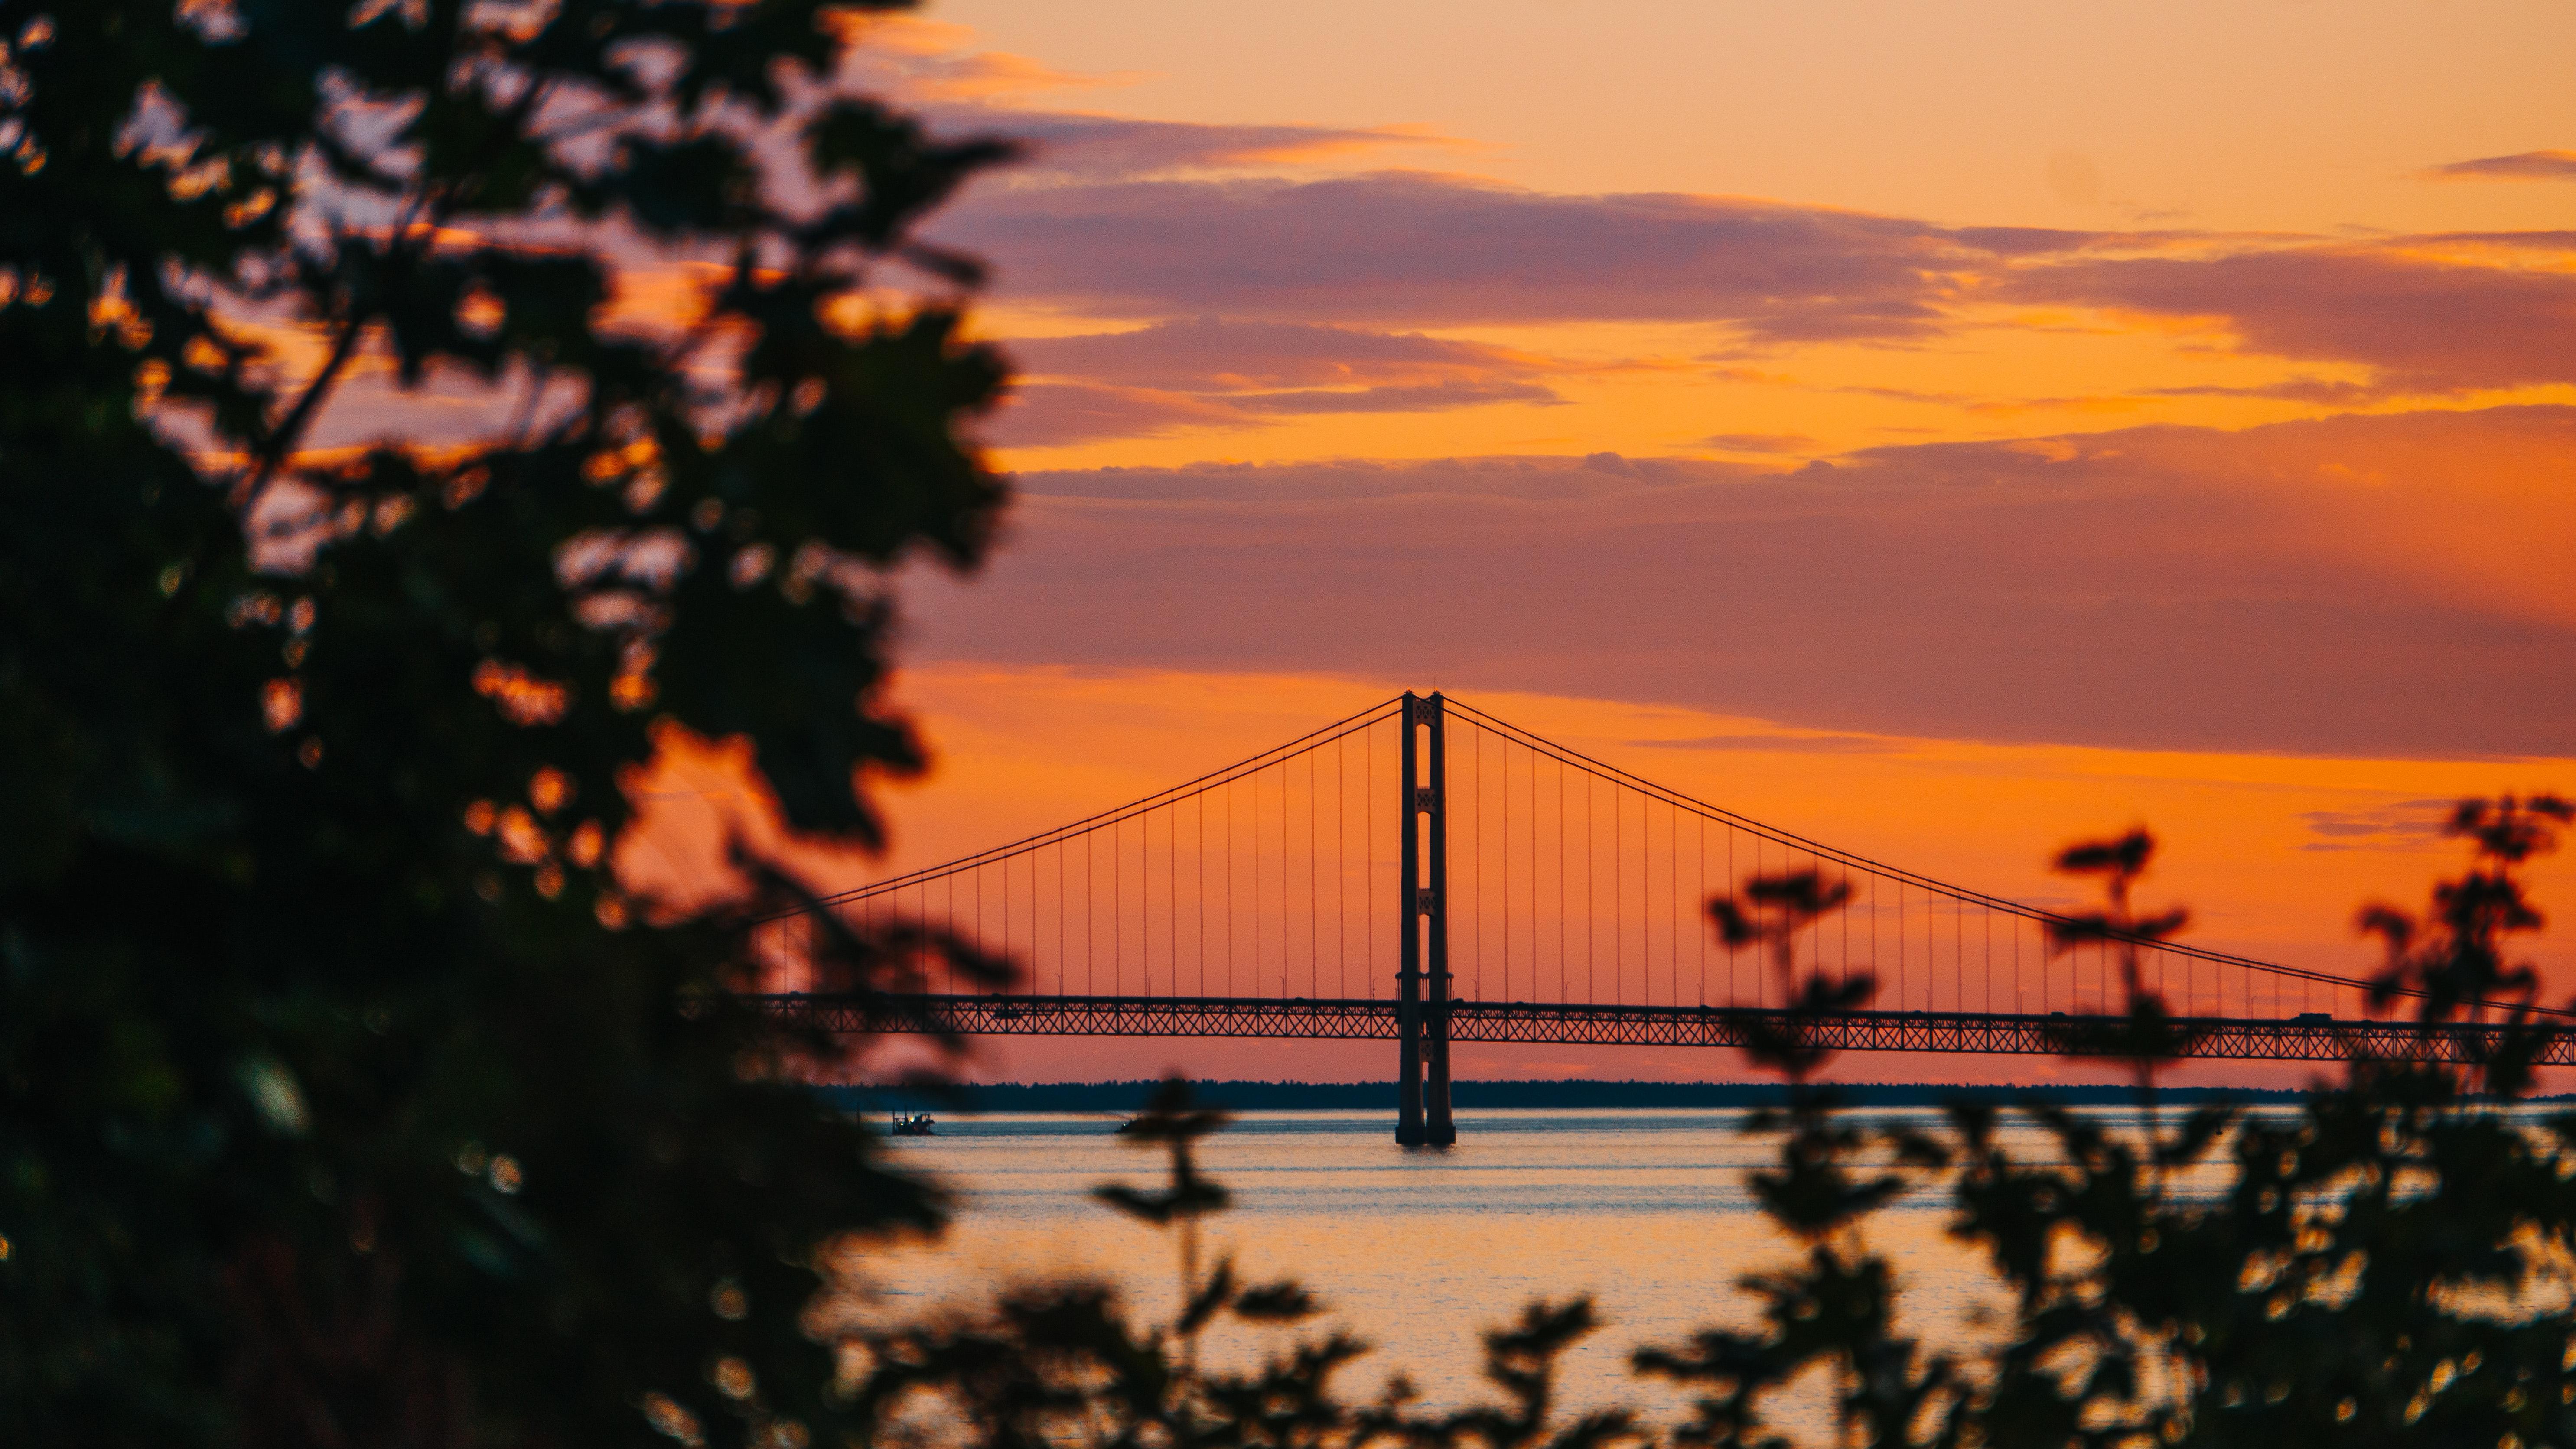 golden gate bridge during golden hour 1574938502 - Golden Gate Bridge During Golden Hour -